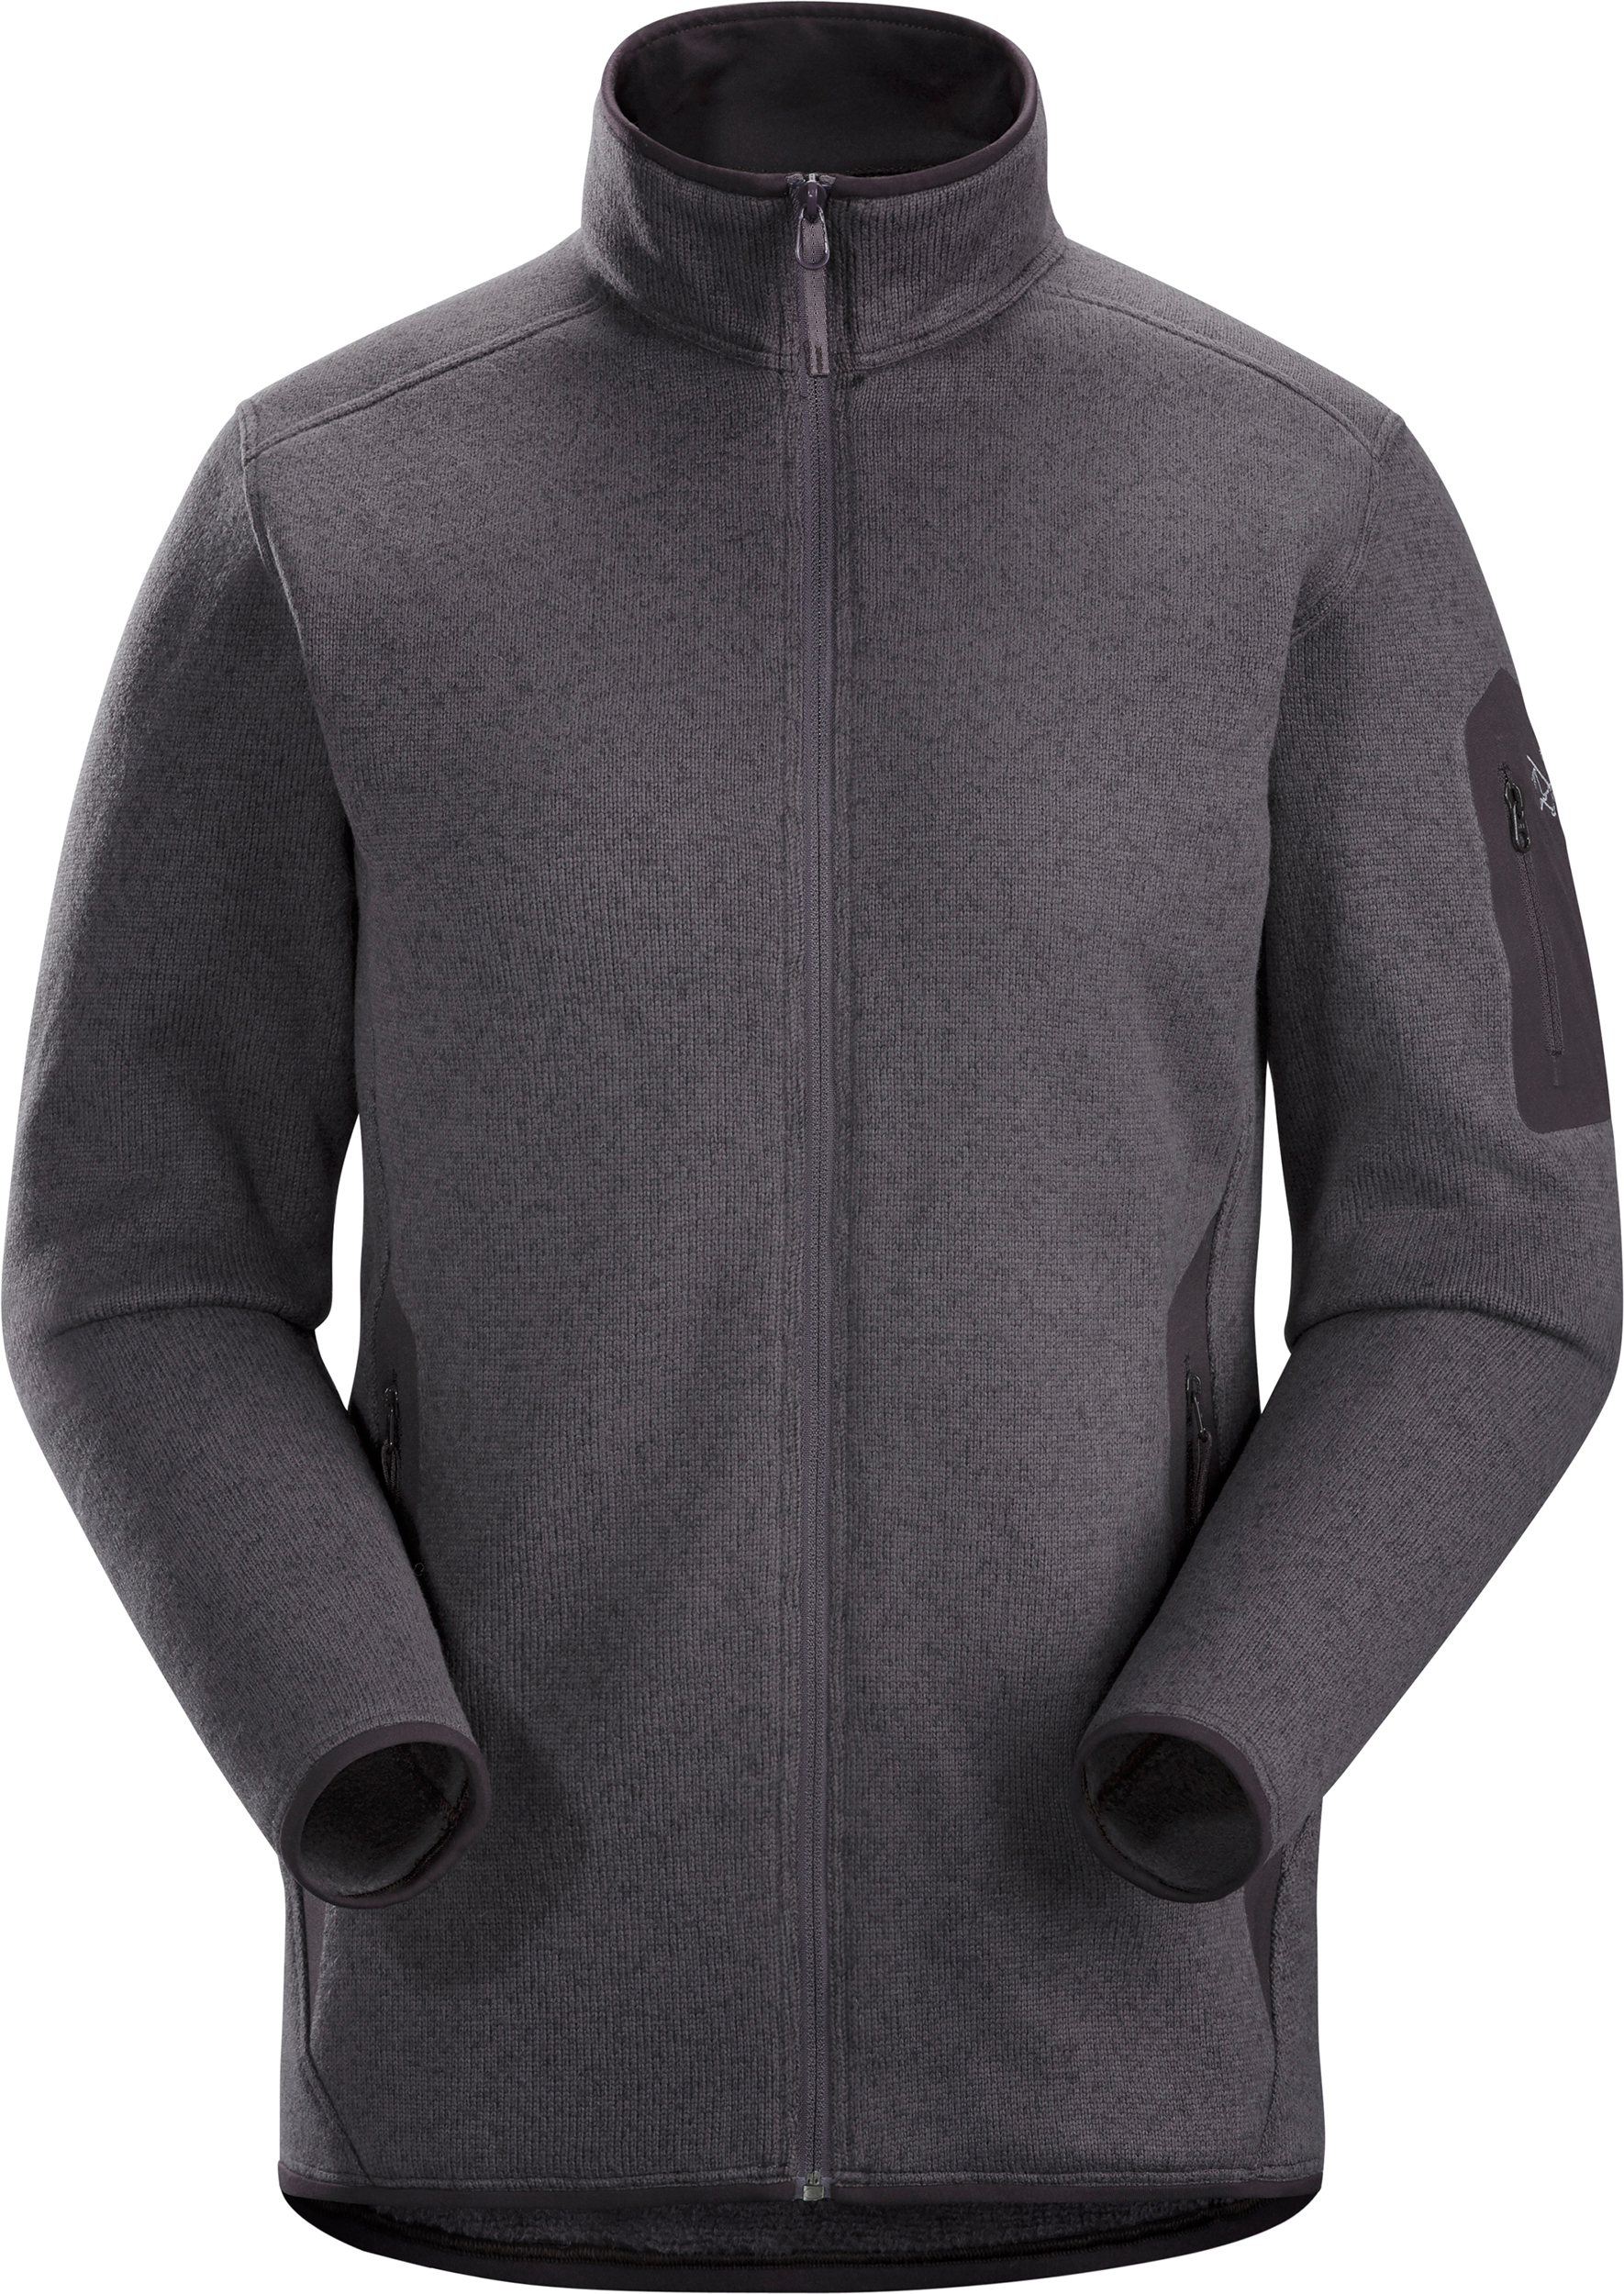 wholesale dealer 966db cc303 Fleece, hoodies and sweaters   MEC